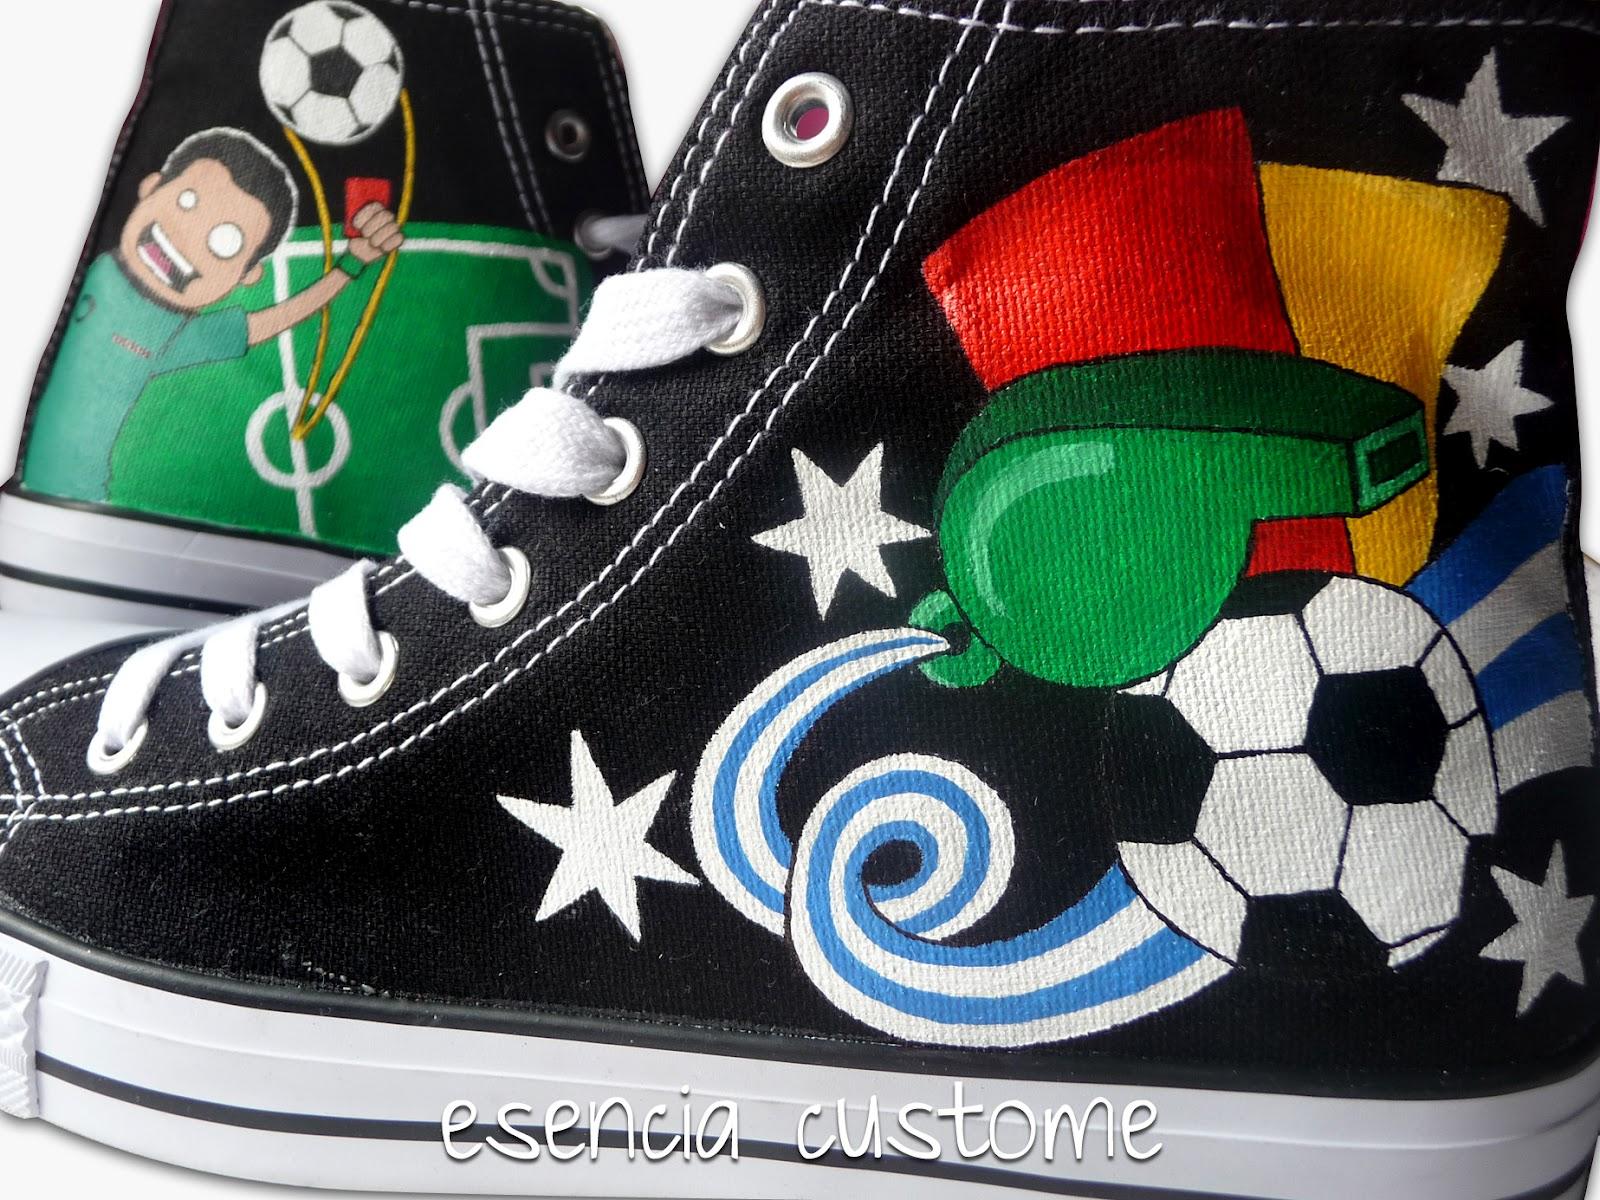 Fiordo Bolsa Villano  Esencia Custome: Zapatillas personalizadas - Custom sneakers: Zapatillas